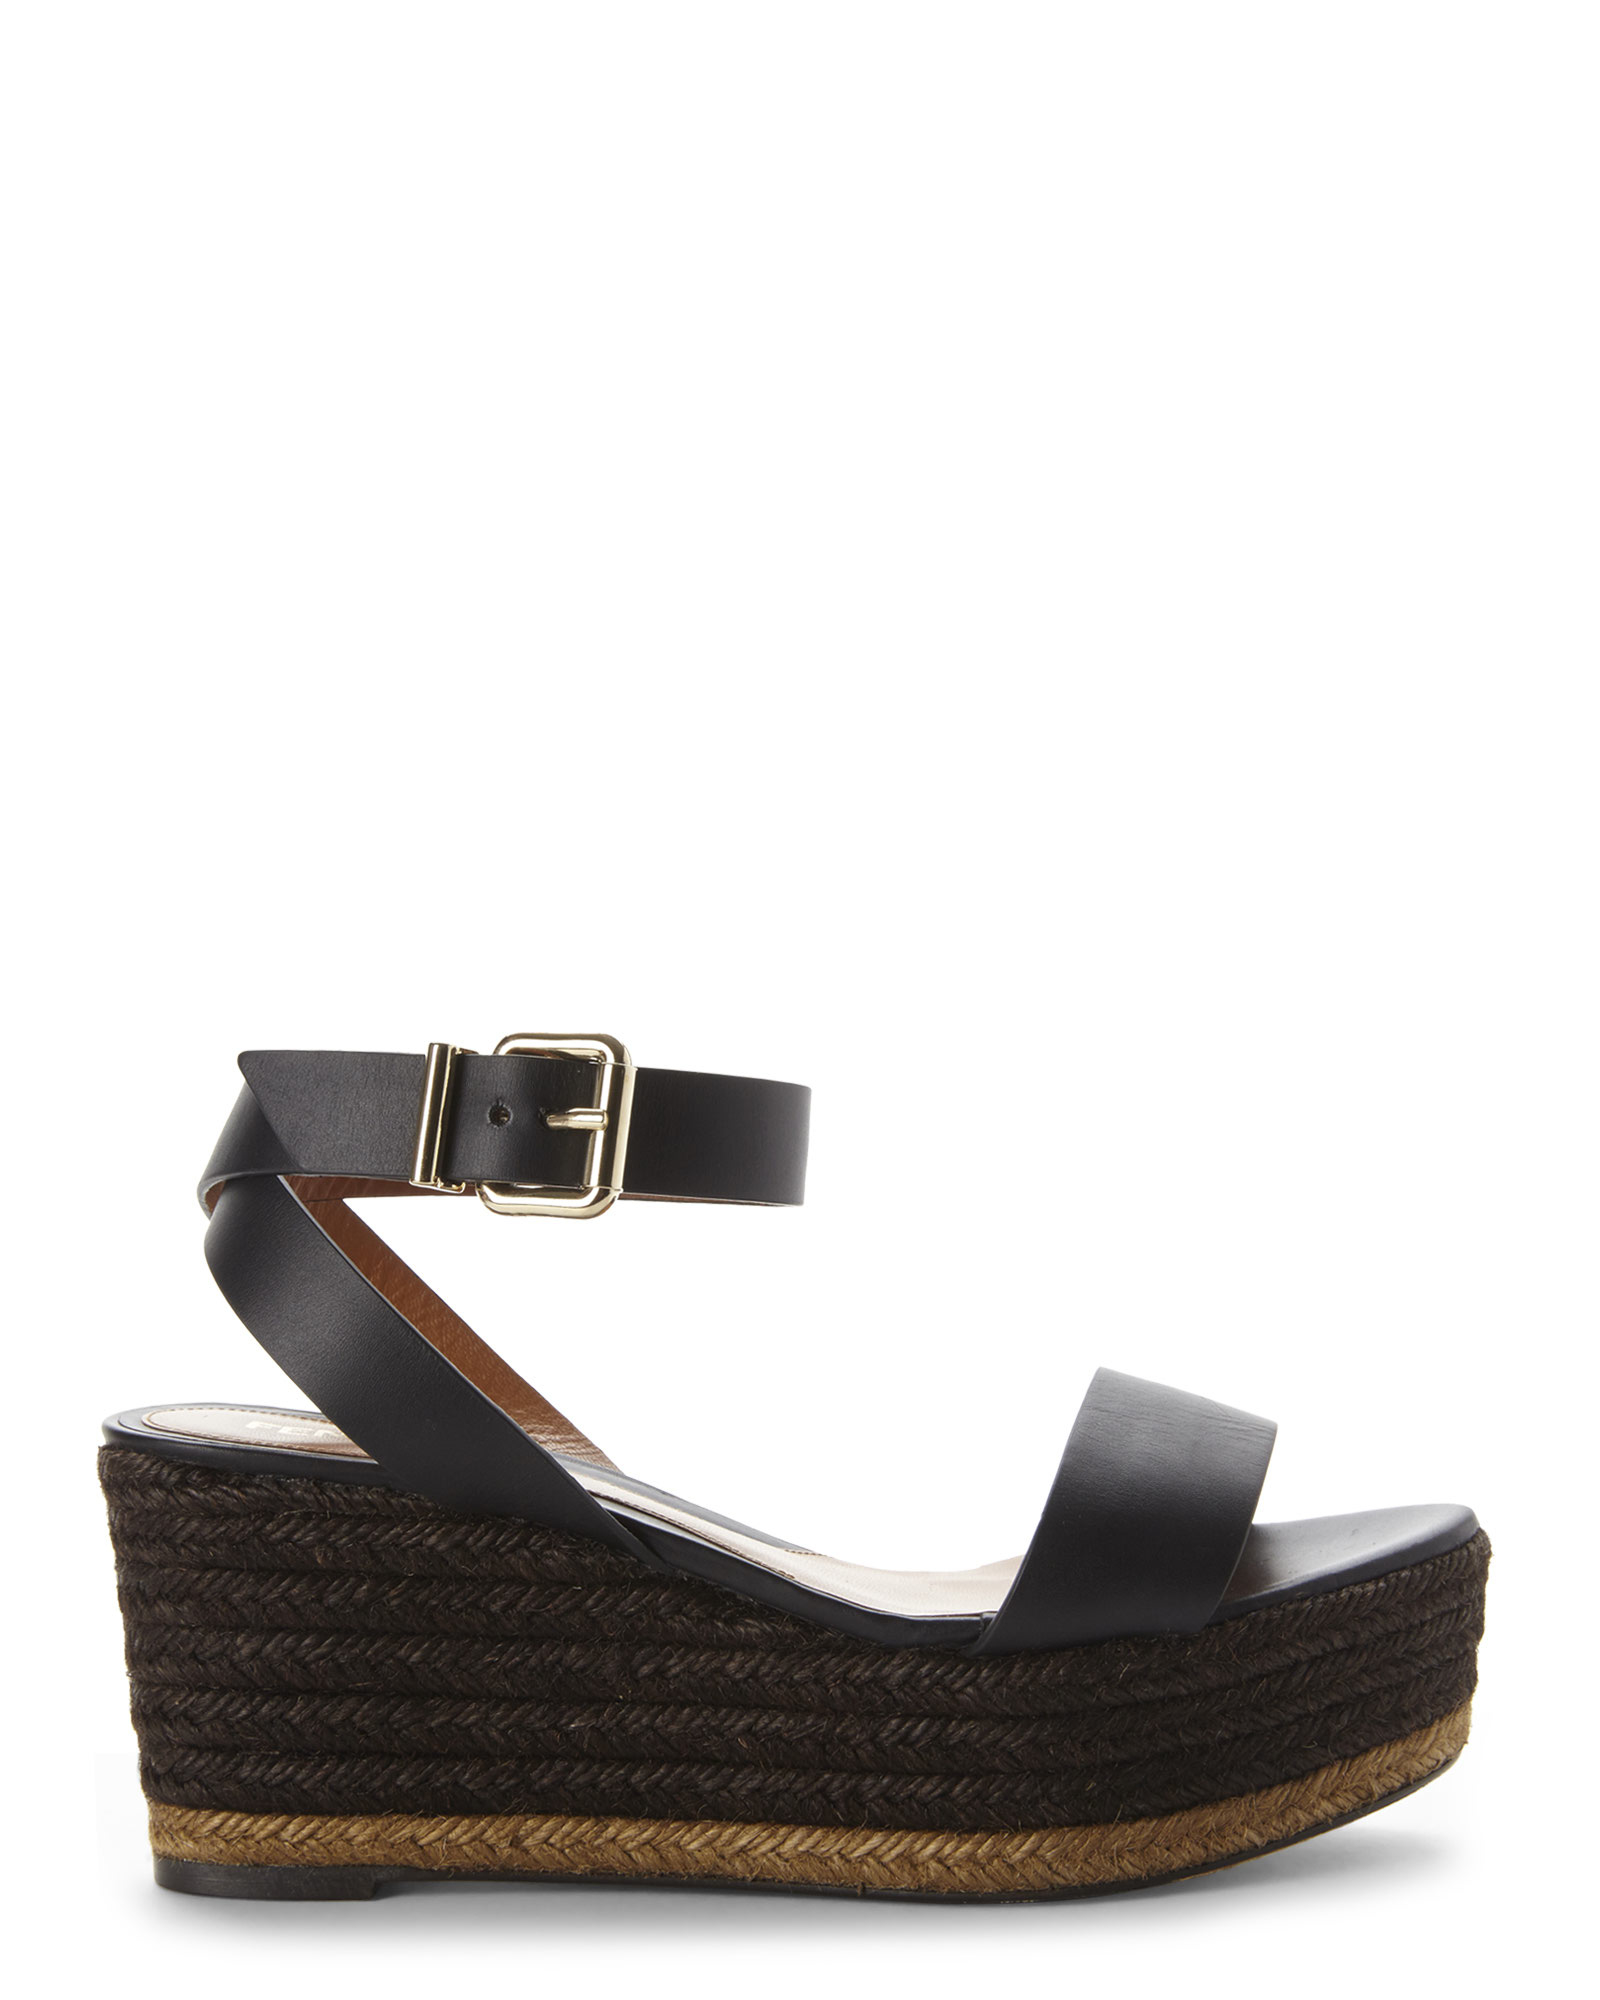 best place sale online cheap best Fendi Leather Espadrille Sandals cheap popular clearance footlocker FBdZdHS